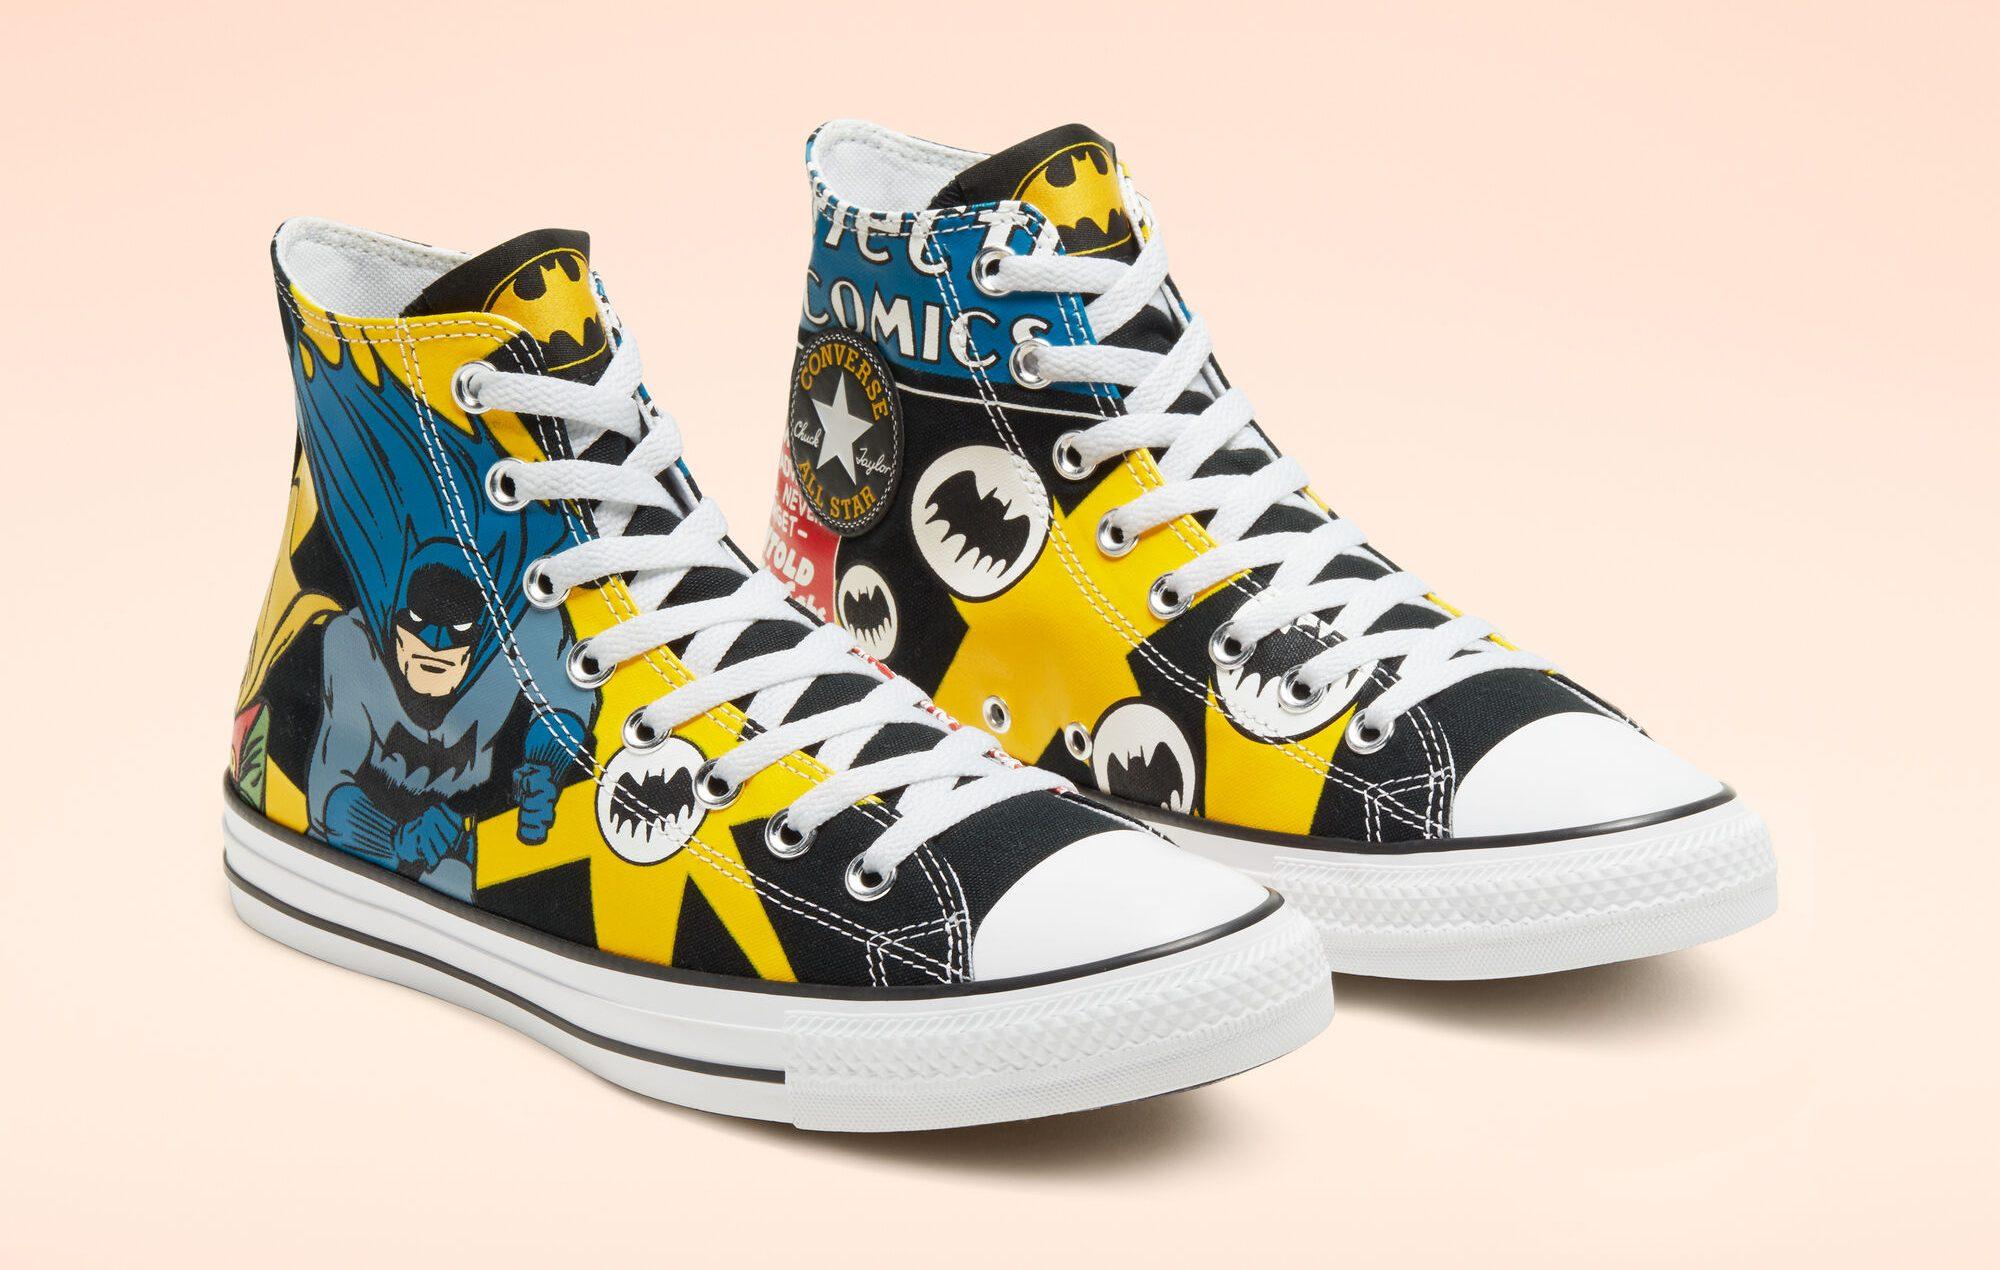 batman converse e1571776228700 150x150 - Holy smokes! Converse has a new line of Batman-themed shoes